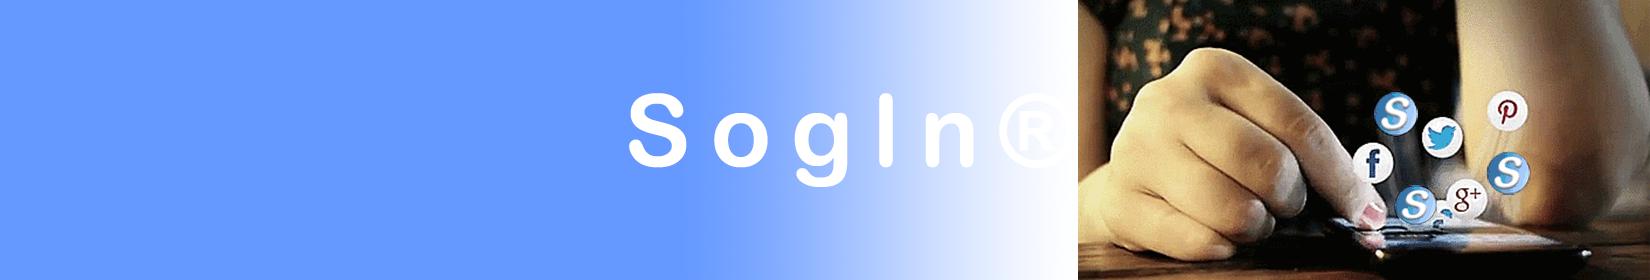 Sogln®